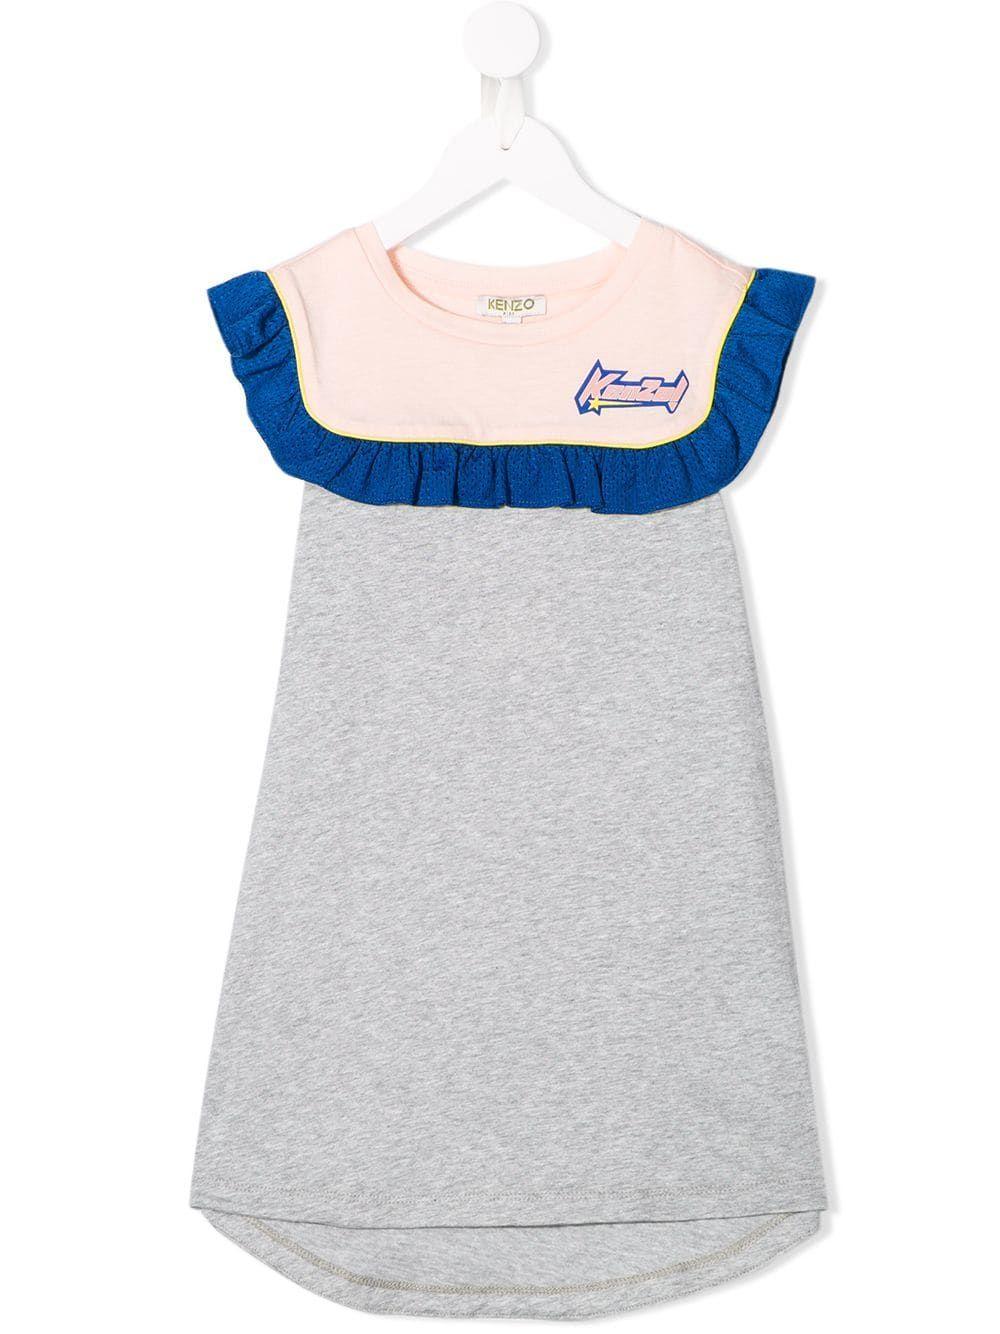 96bea8977 Kenzo Kids Racing dress - Grey in 2019 | Products | Girls designer ...